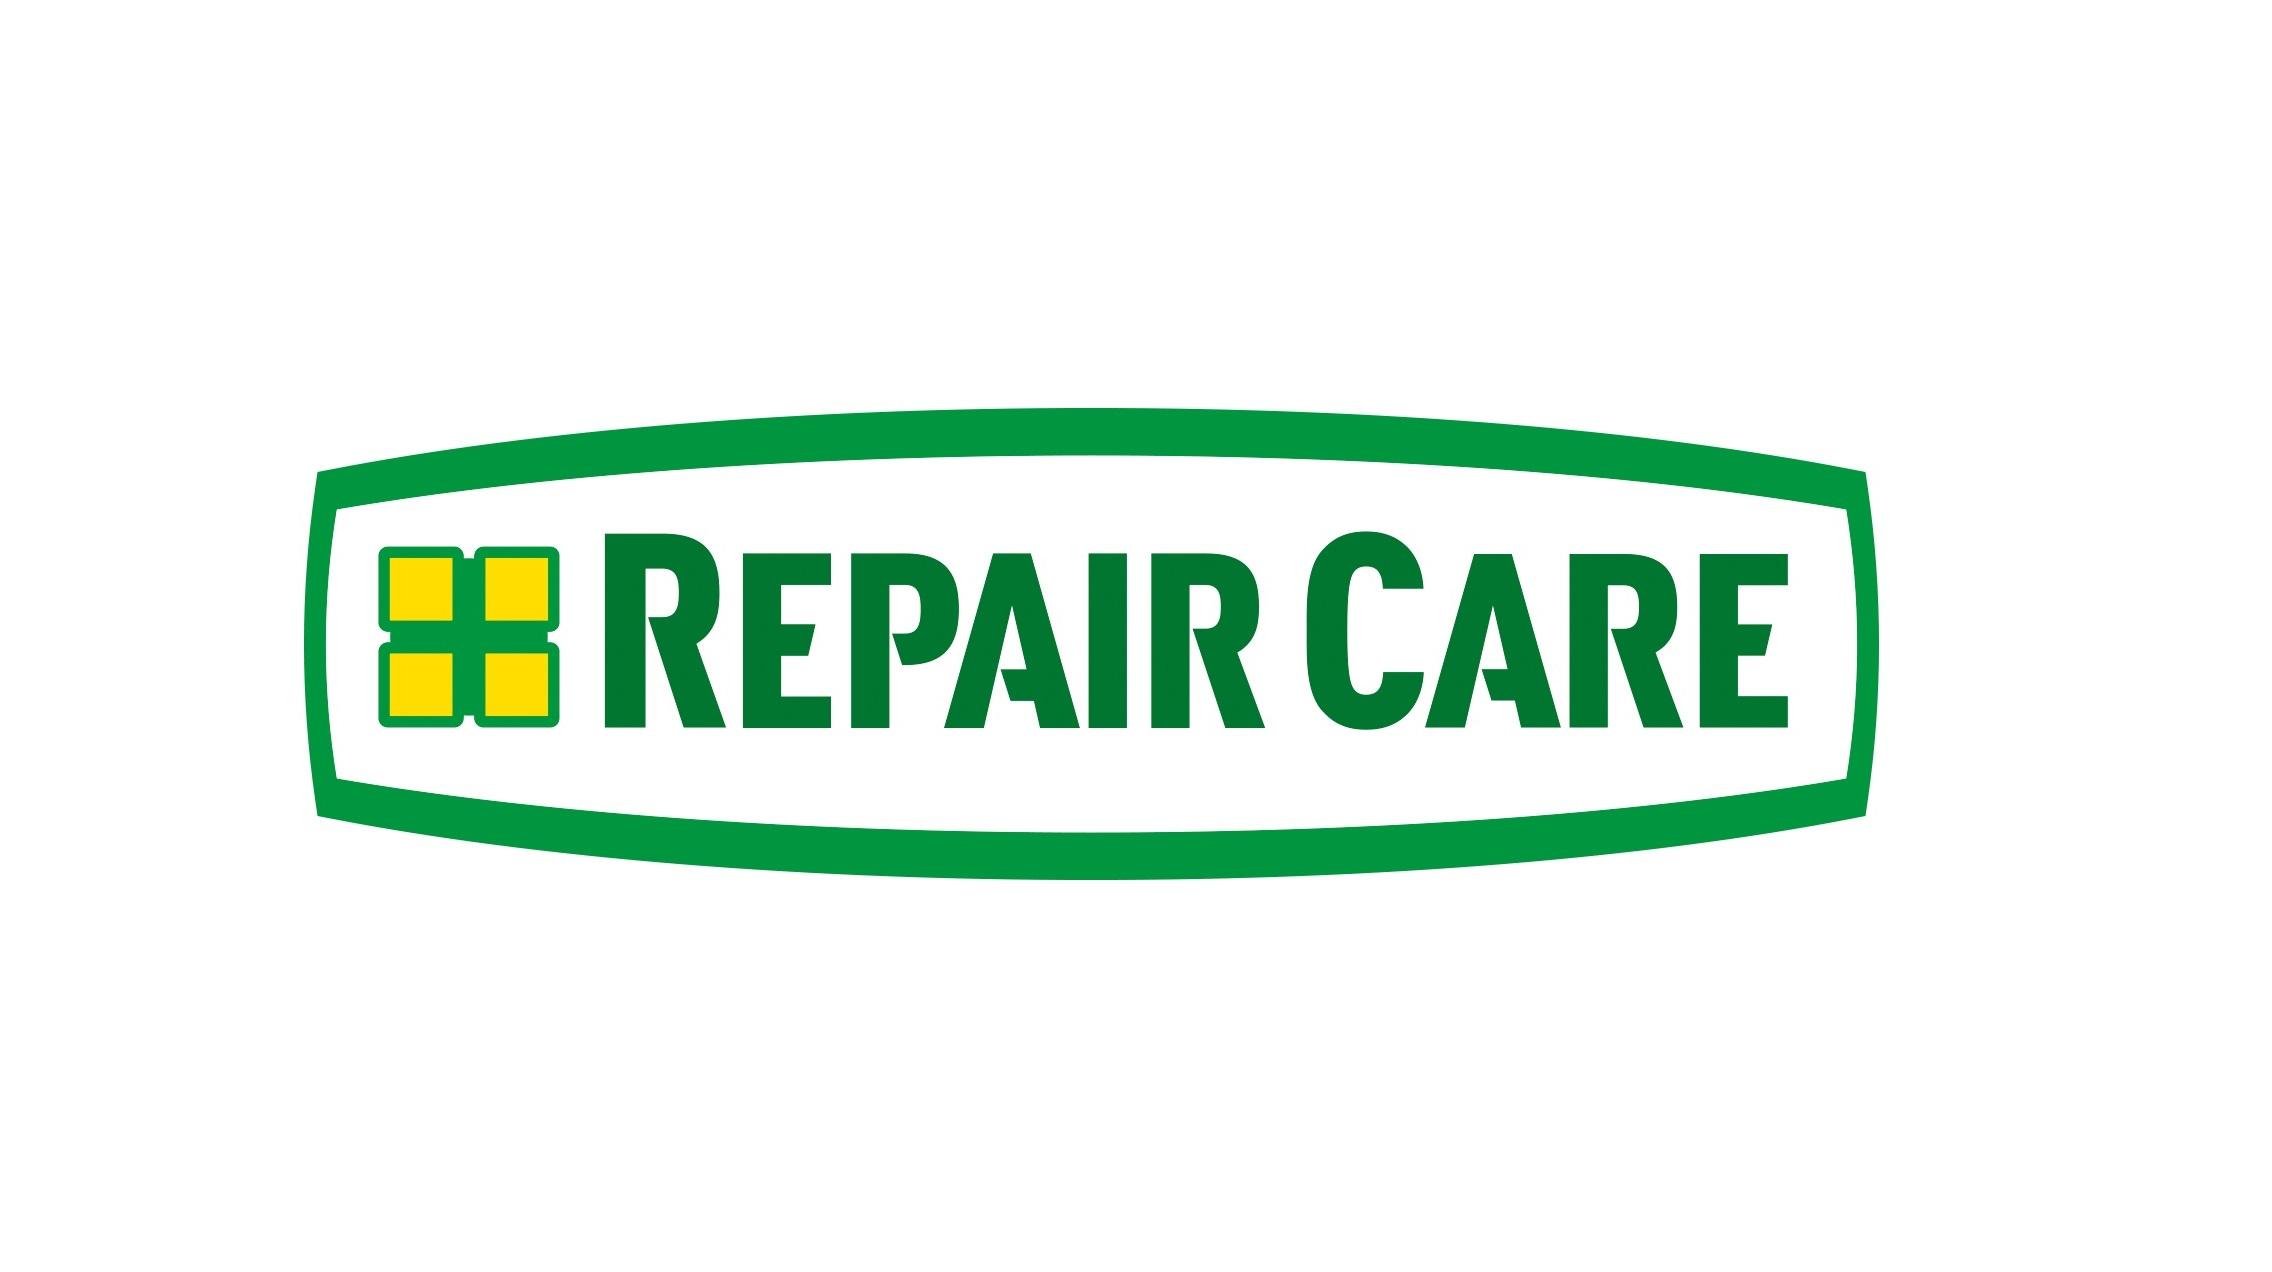 Repair-care-opdrachtgever-van-lyncwise-executive-search-interim